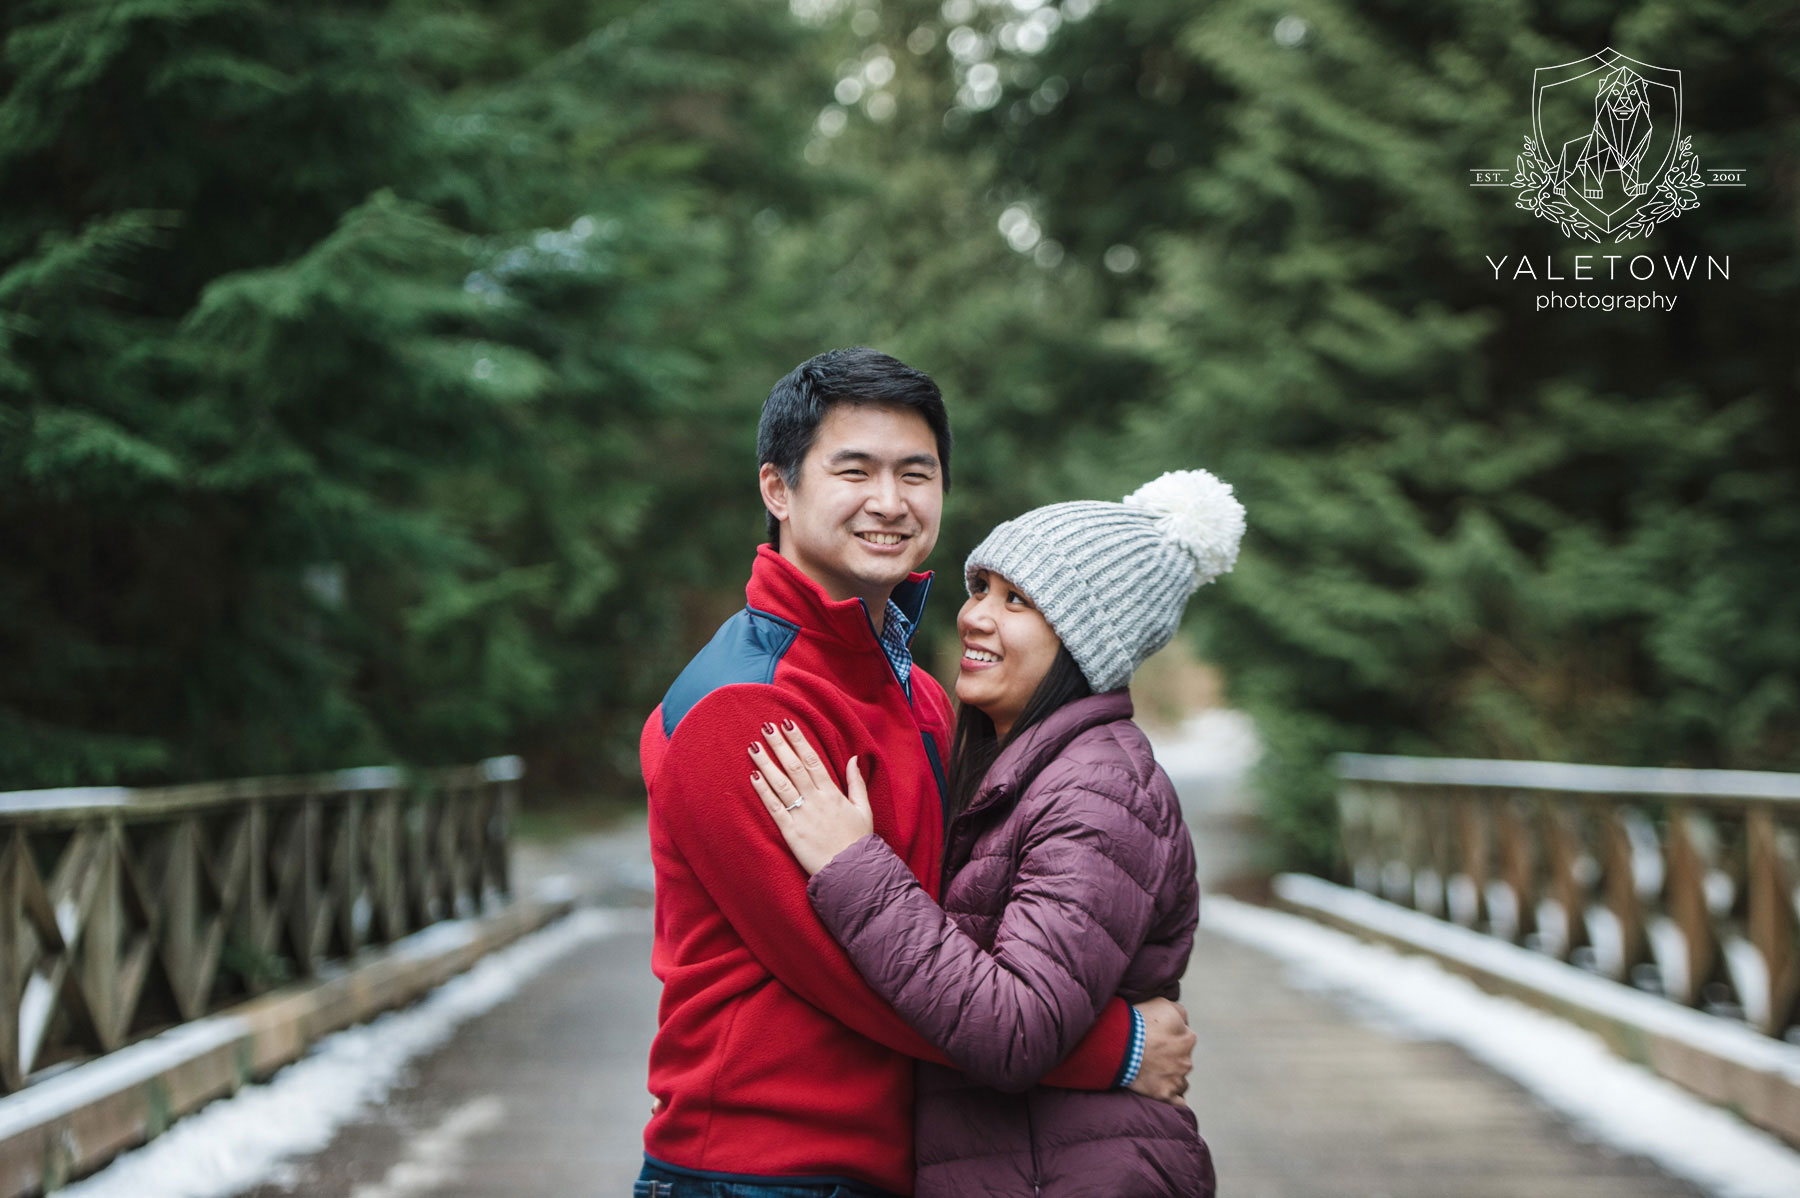 Wedding-Proposal-Vancouver-Stanley-Park-Wedding-Photographer-Vancouver-Yaletown-Photography-Photo-18.JPG